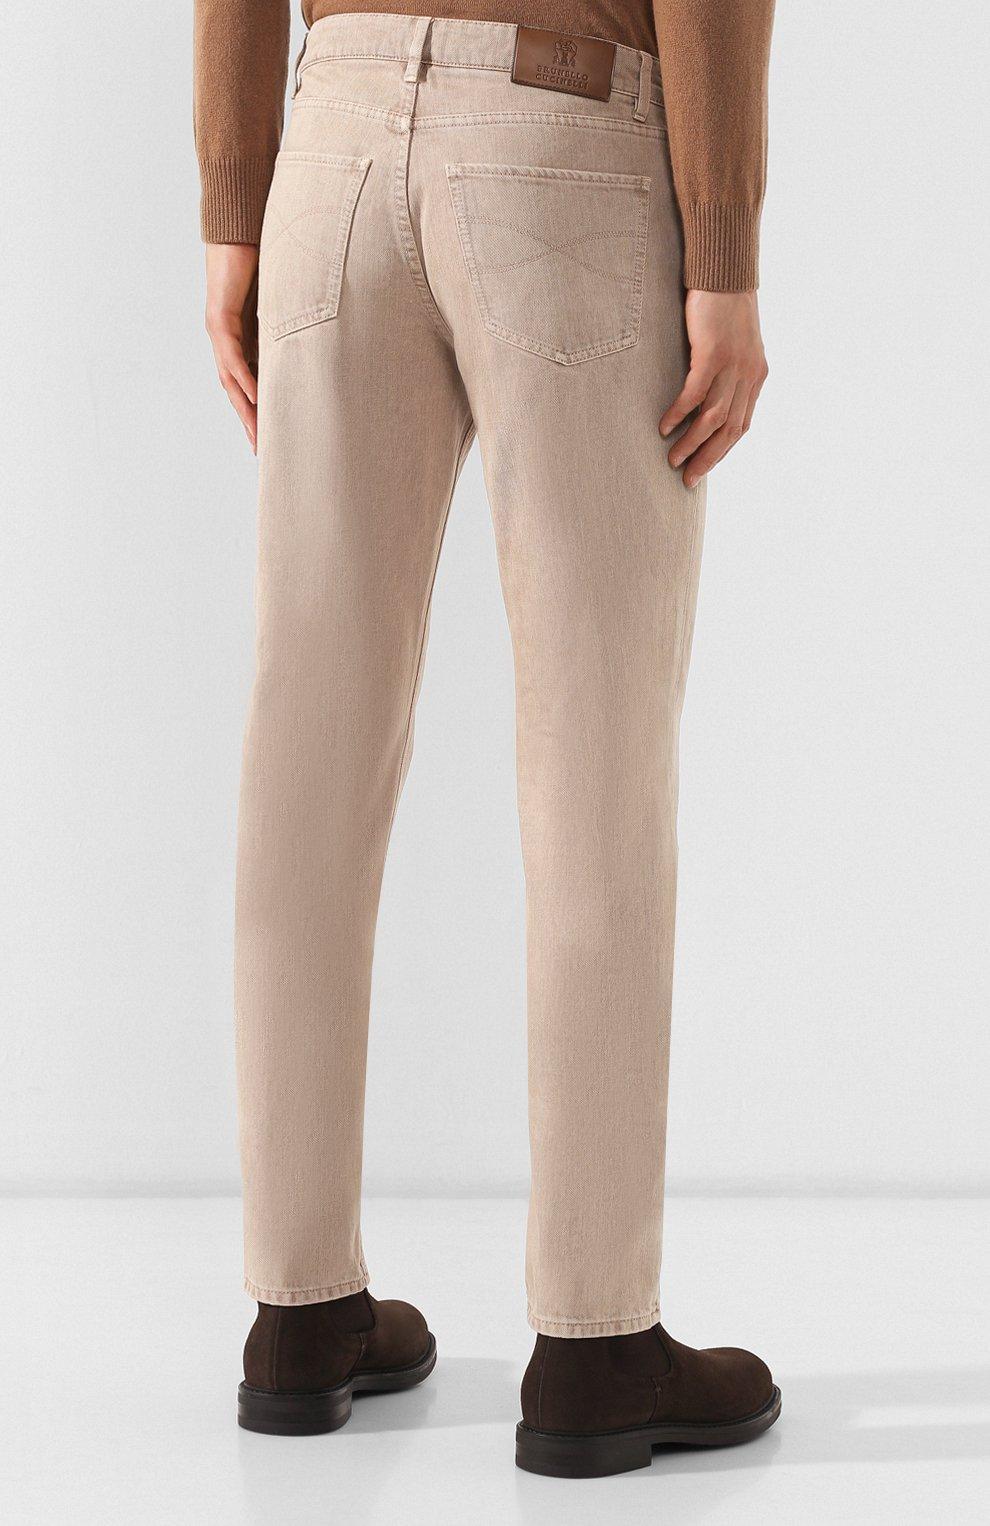 Мужские джинсы BRUNELLO CUCINELLI светло-бежевого цвета, арт. M051KB2210 | Фото 4